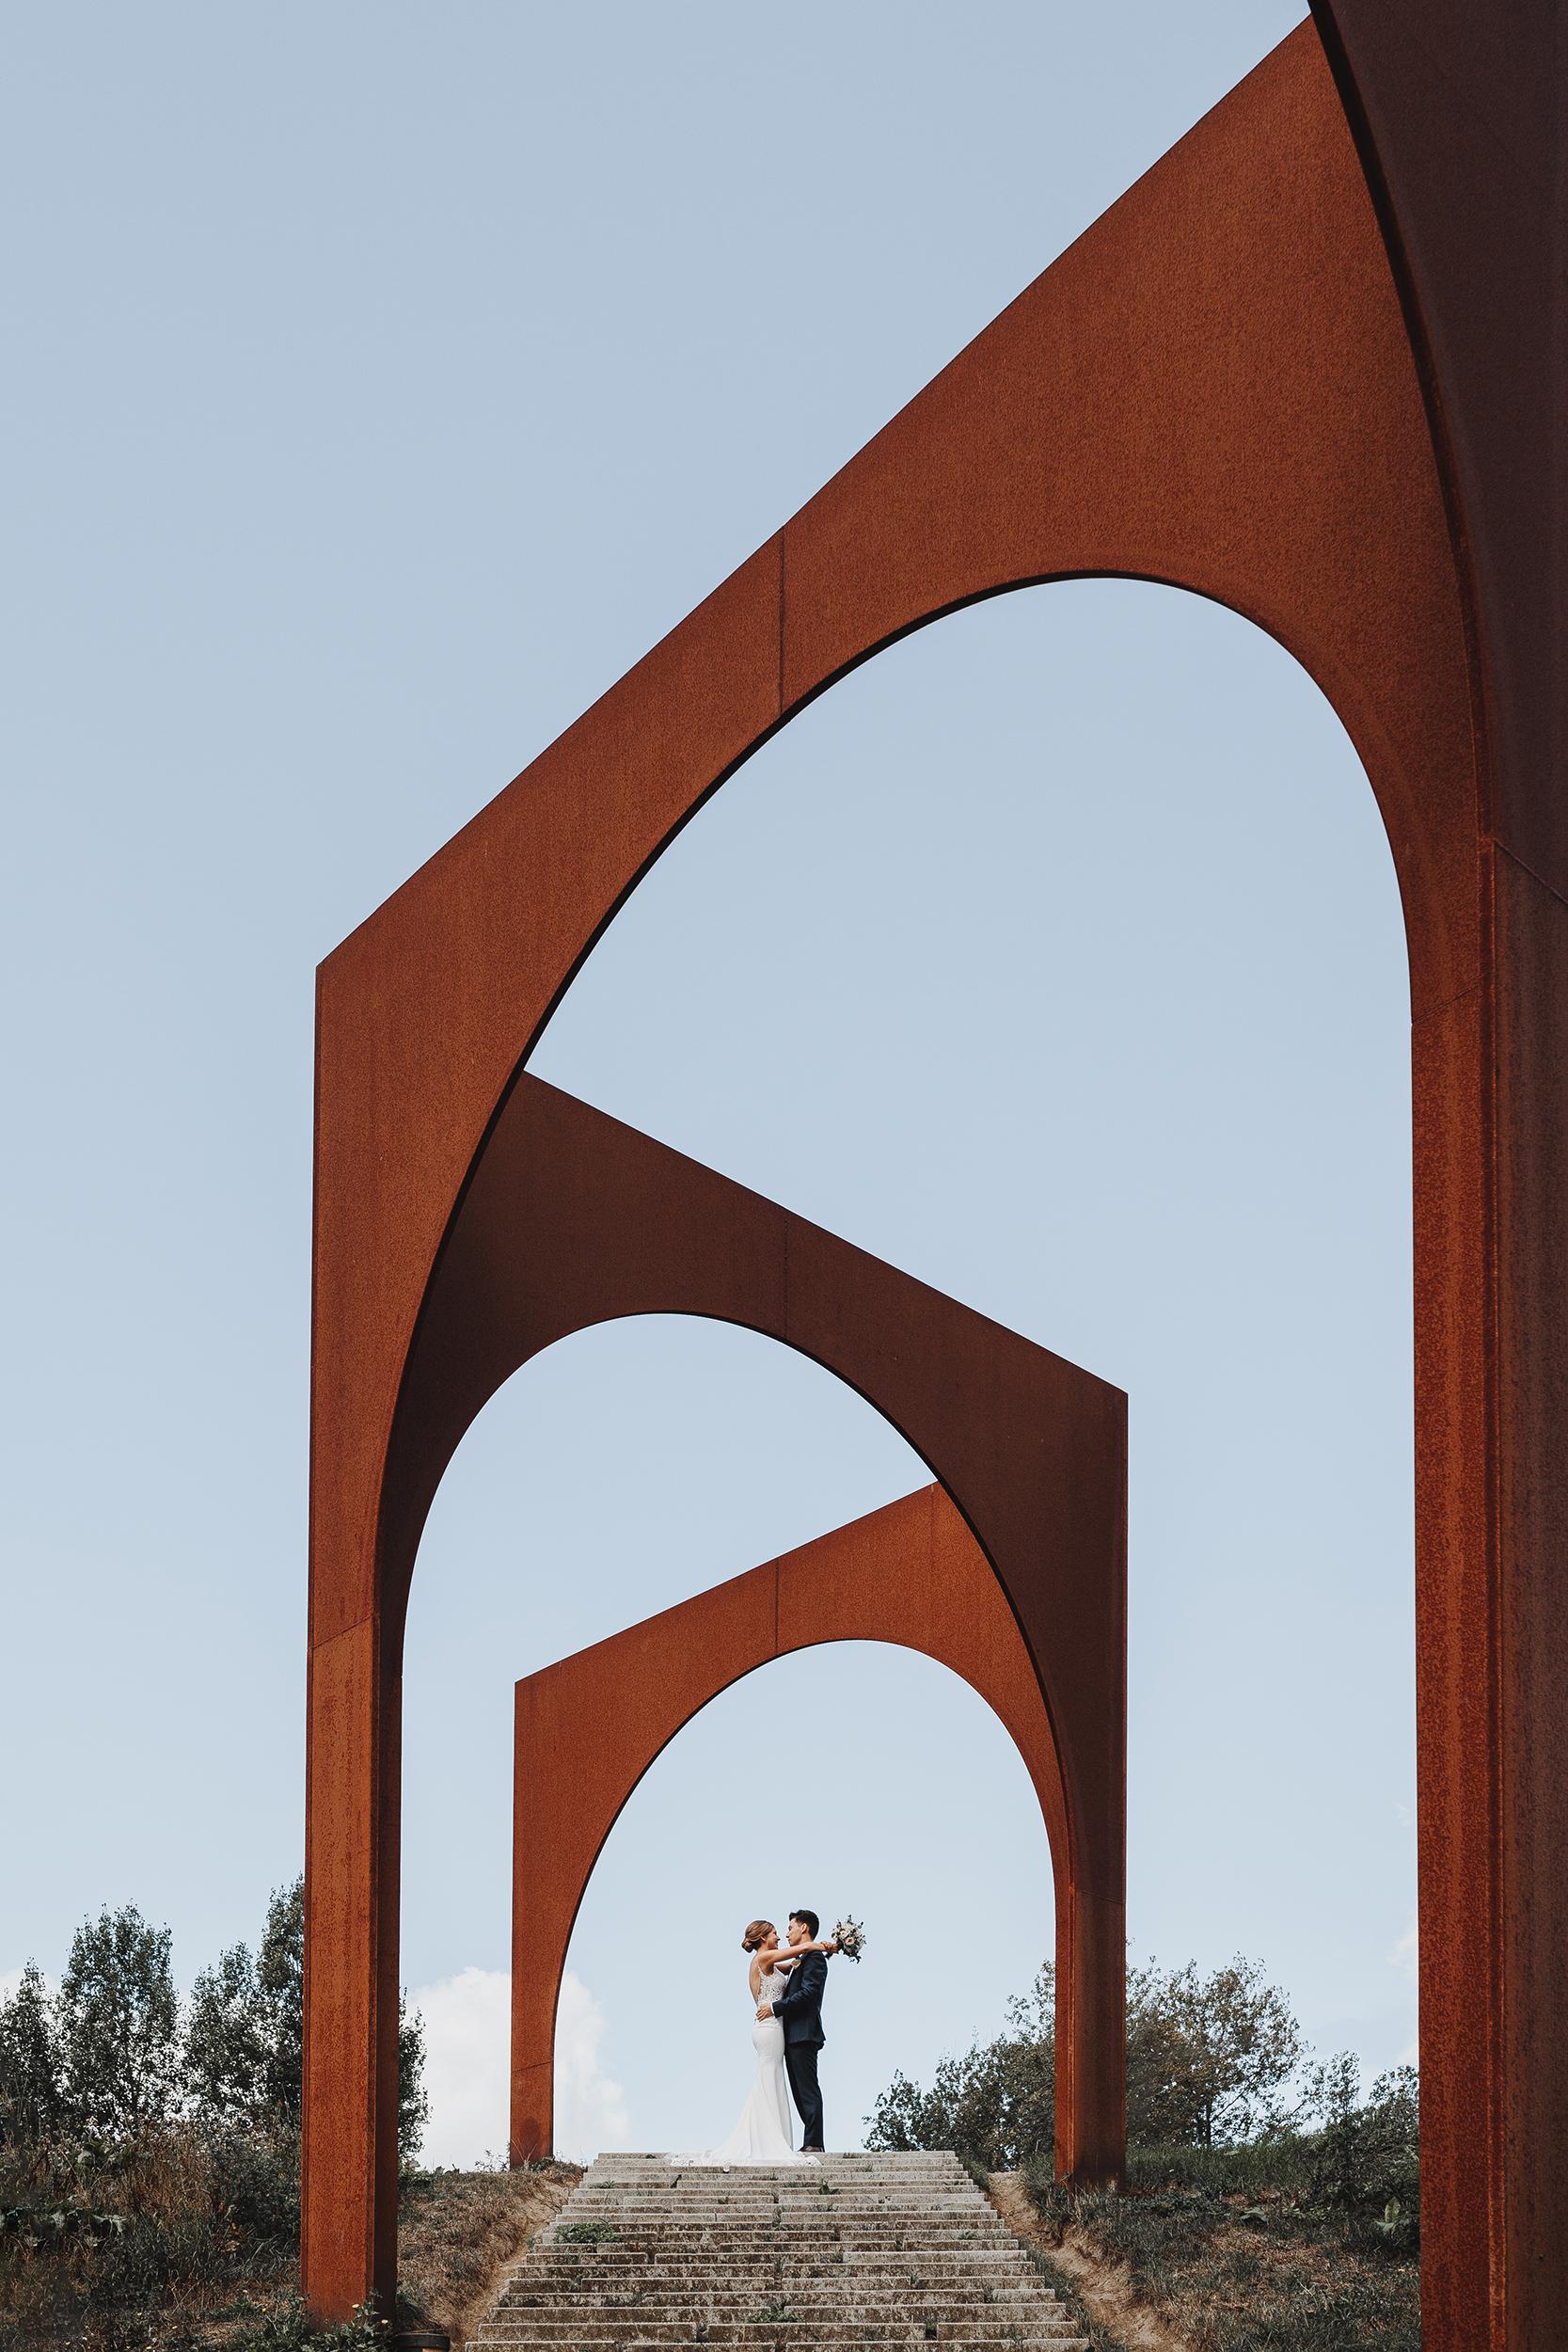 Aline & Raf by Bob Janssens